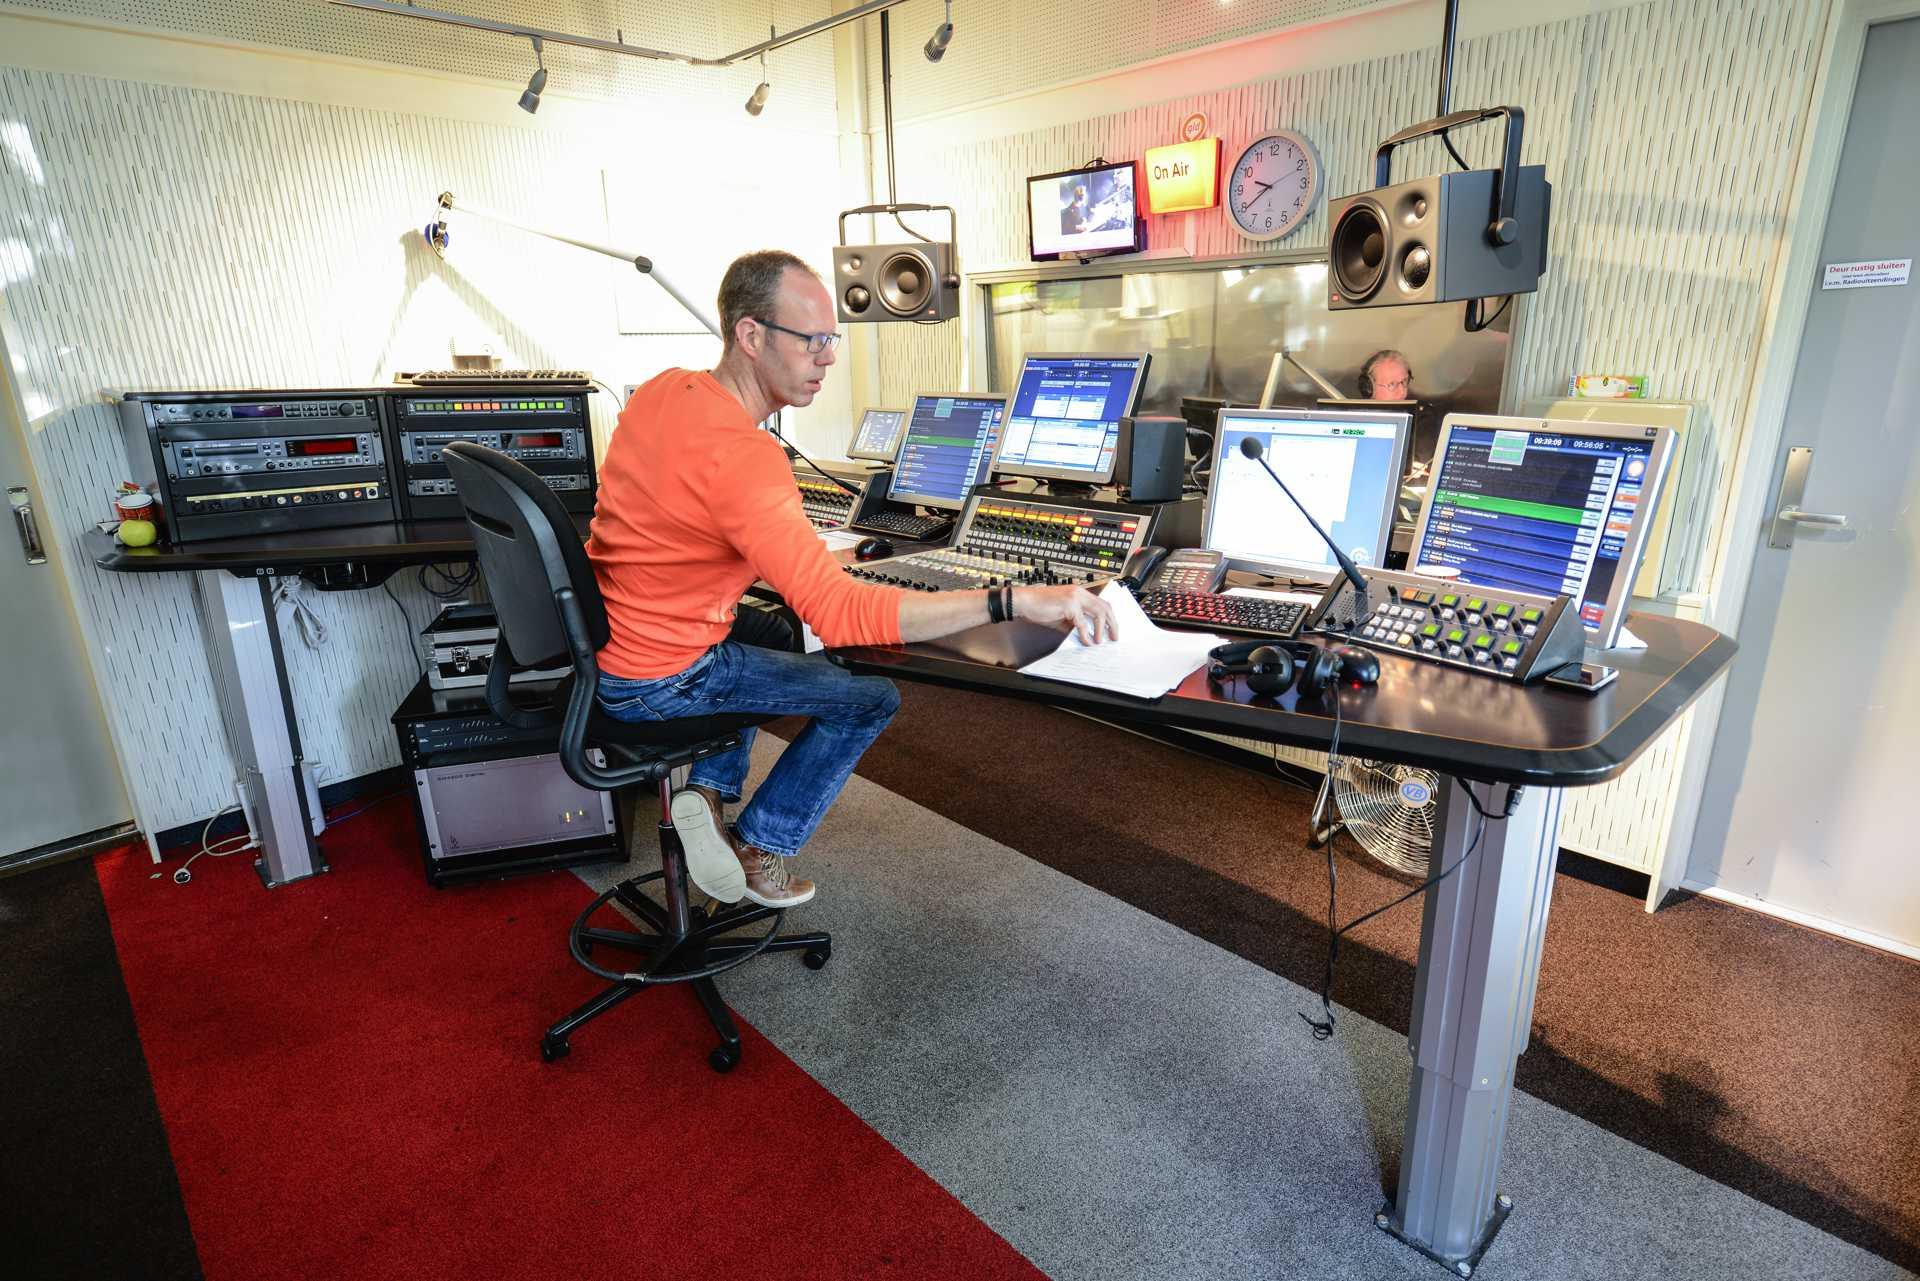 Radio omroep gelderland studio 4 kb mf - Studio meubels ...